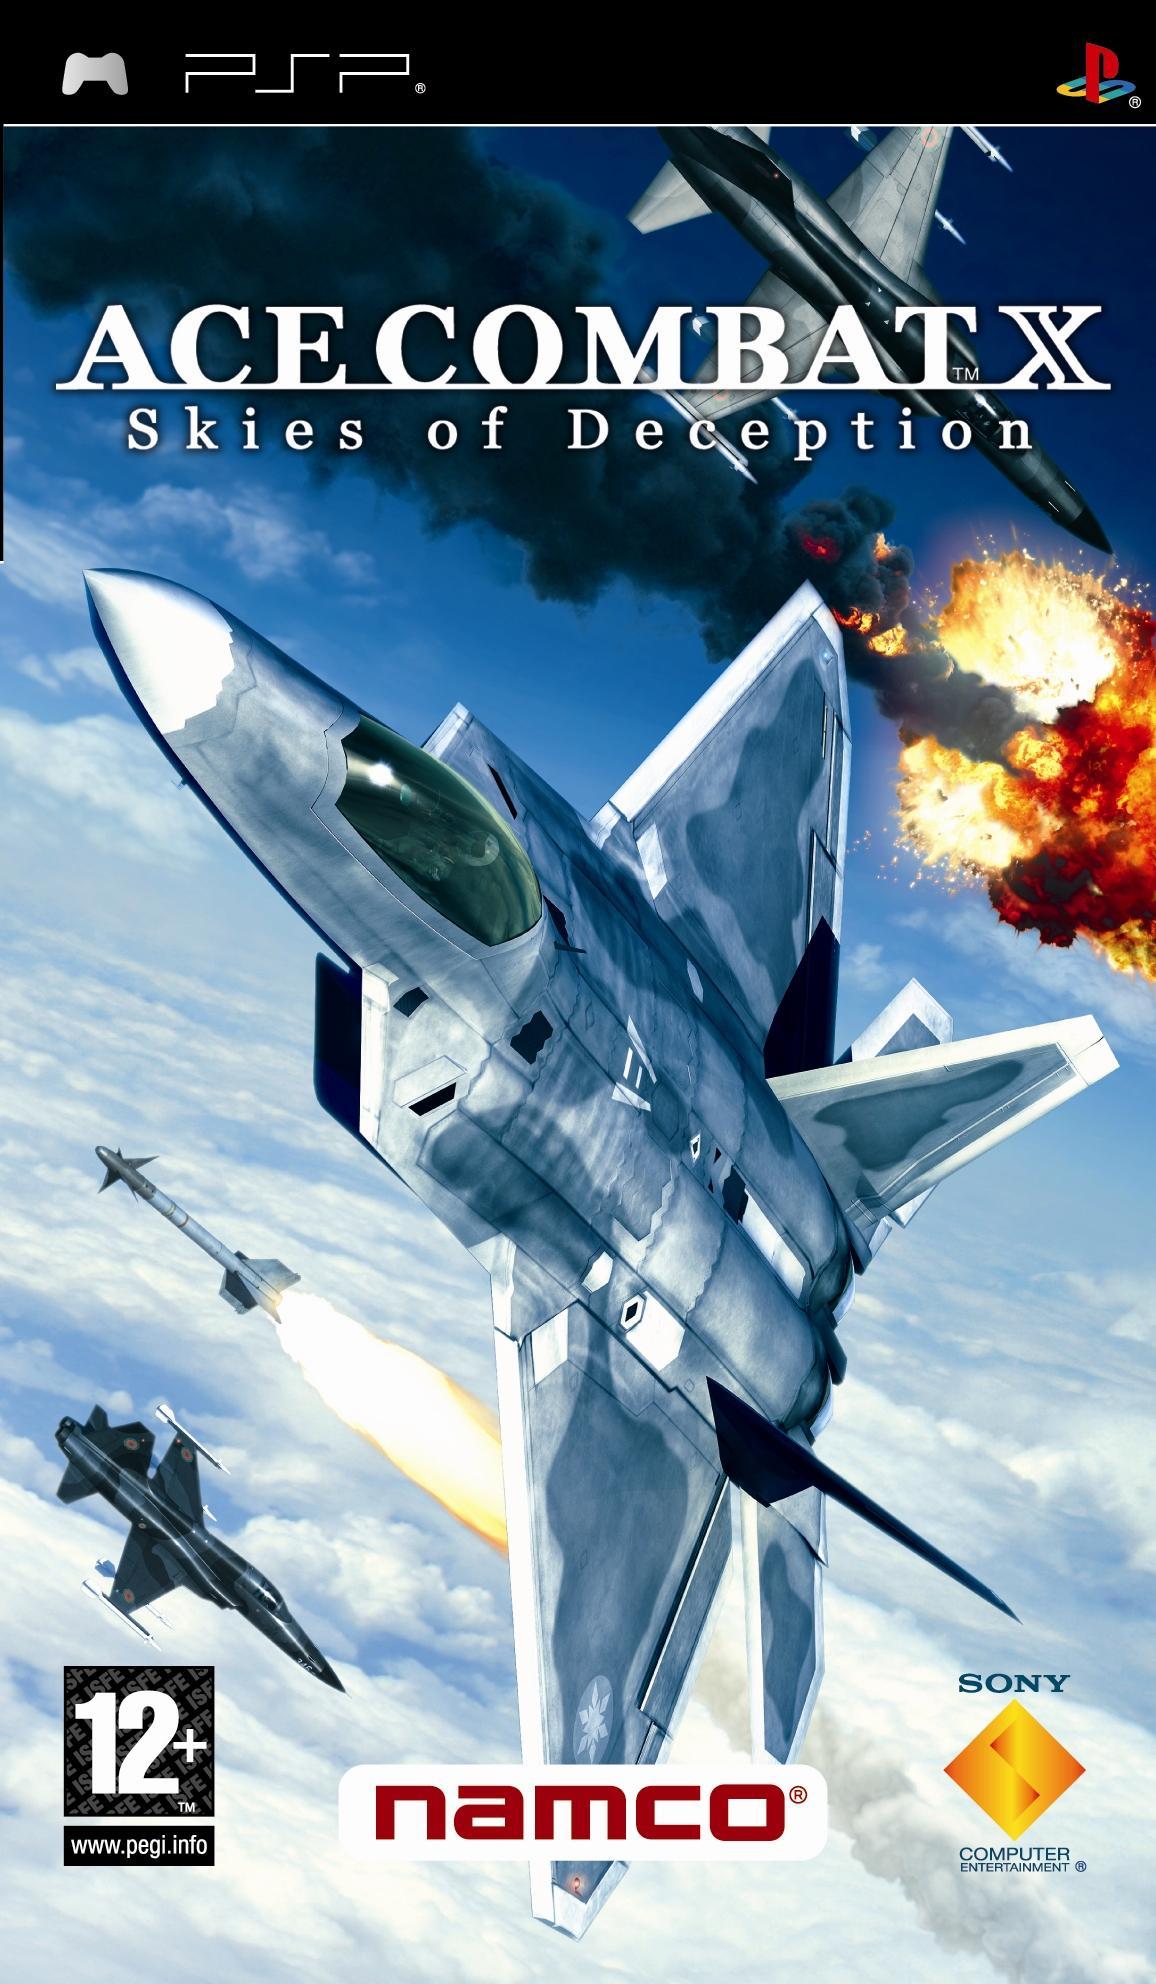 Ace Combat X Skies of Deception